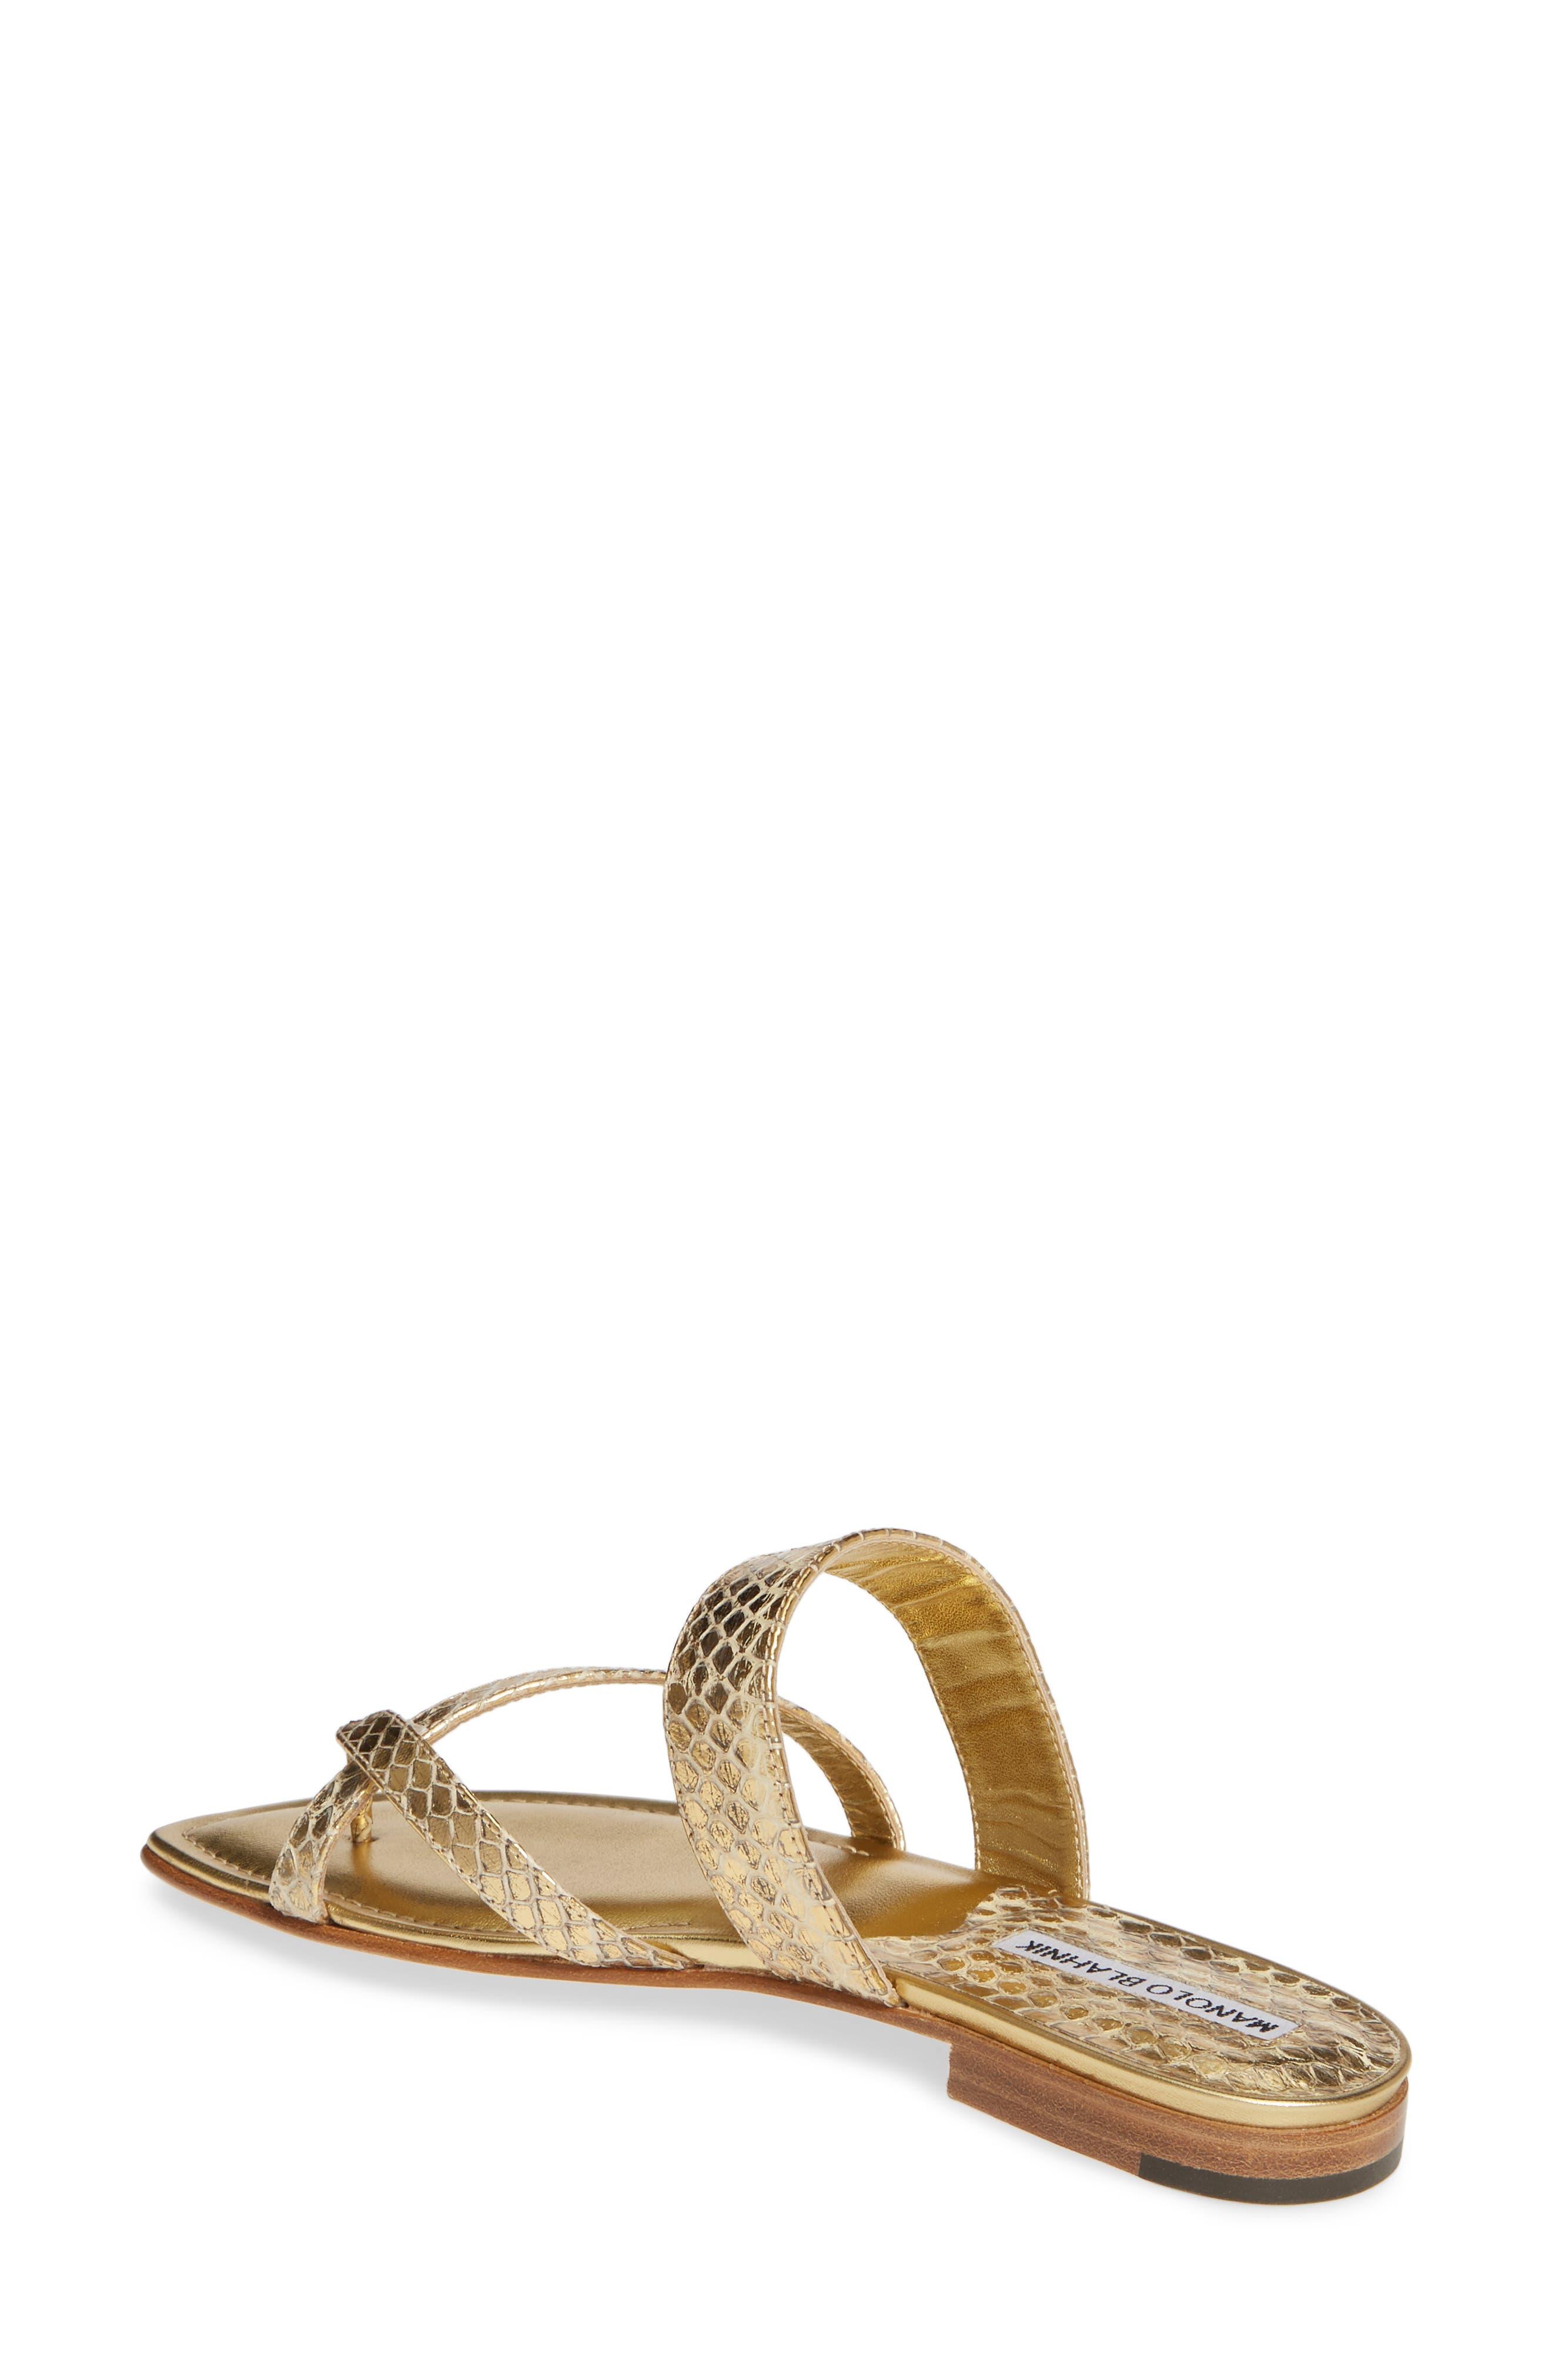 MANOLO BLAHNIK,                             'Susa' Genuine Snakeskin Sandal,                             Alternate thumbnail 2, color,                             GOLD WATERSNAKE